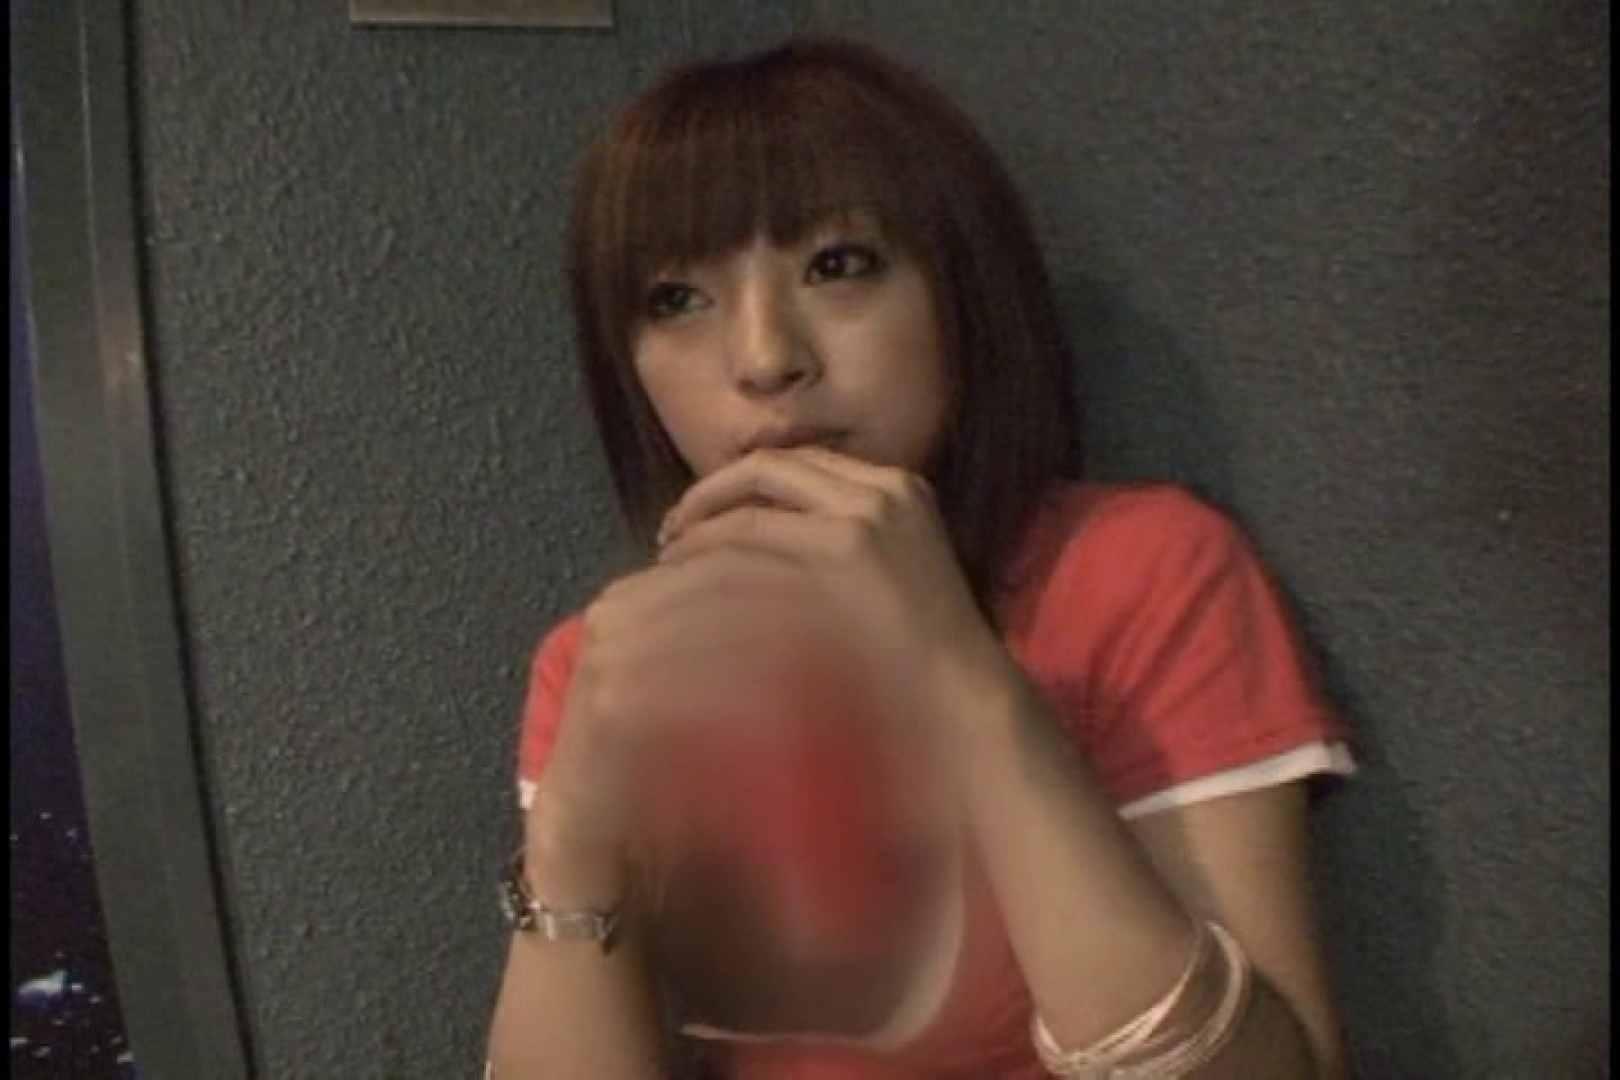 JDハンター全国ツアー vol.019 前編 女子大生のエロ動画 | 0  103PIX 47